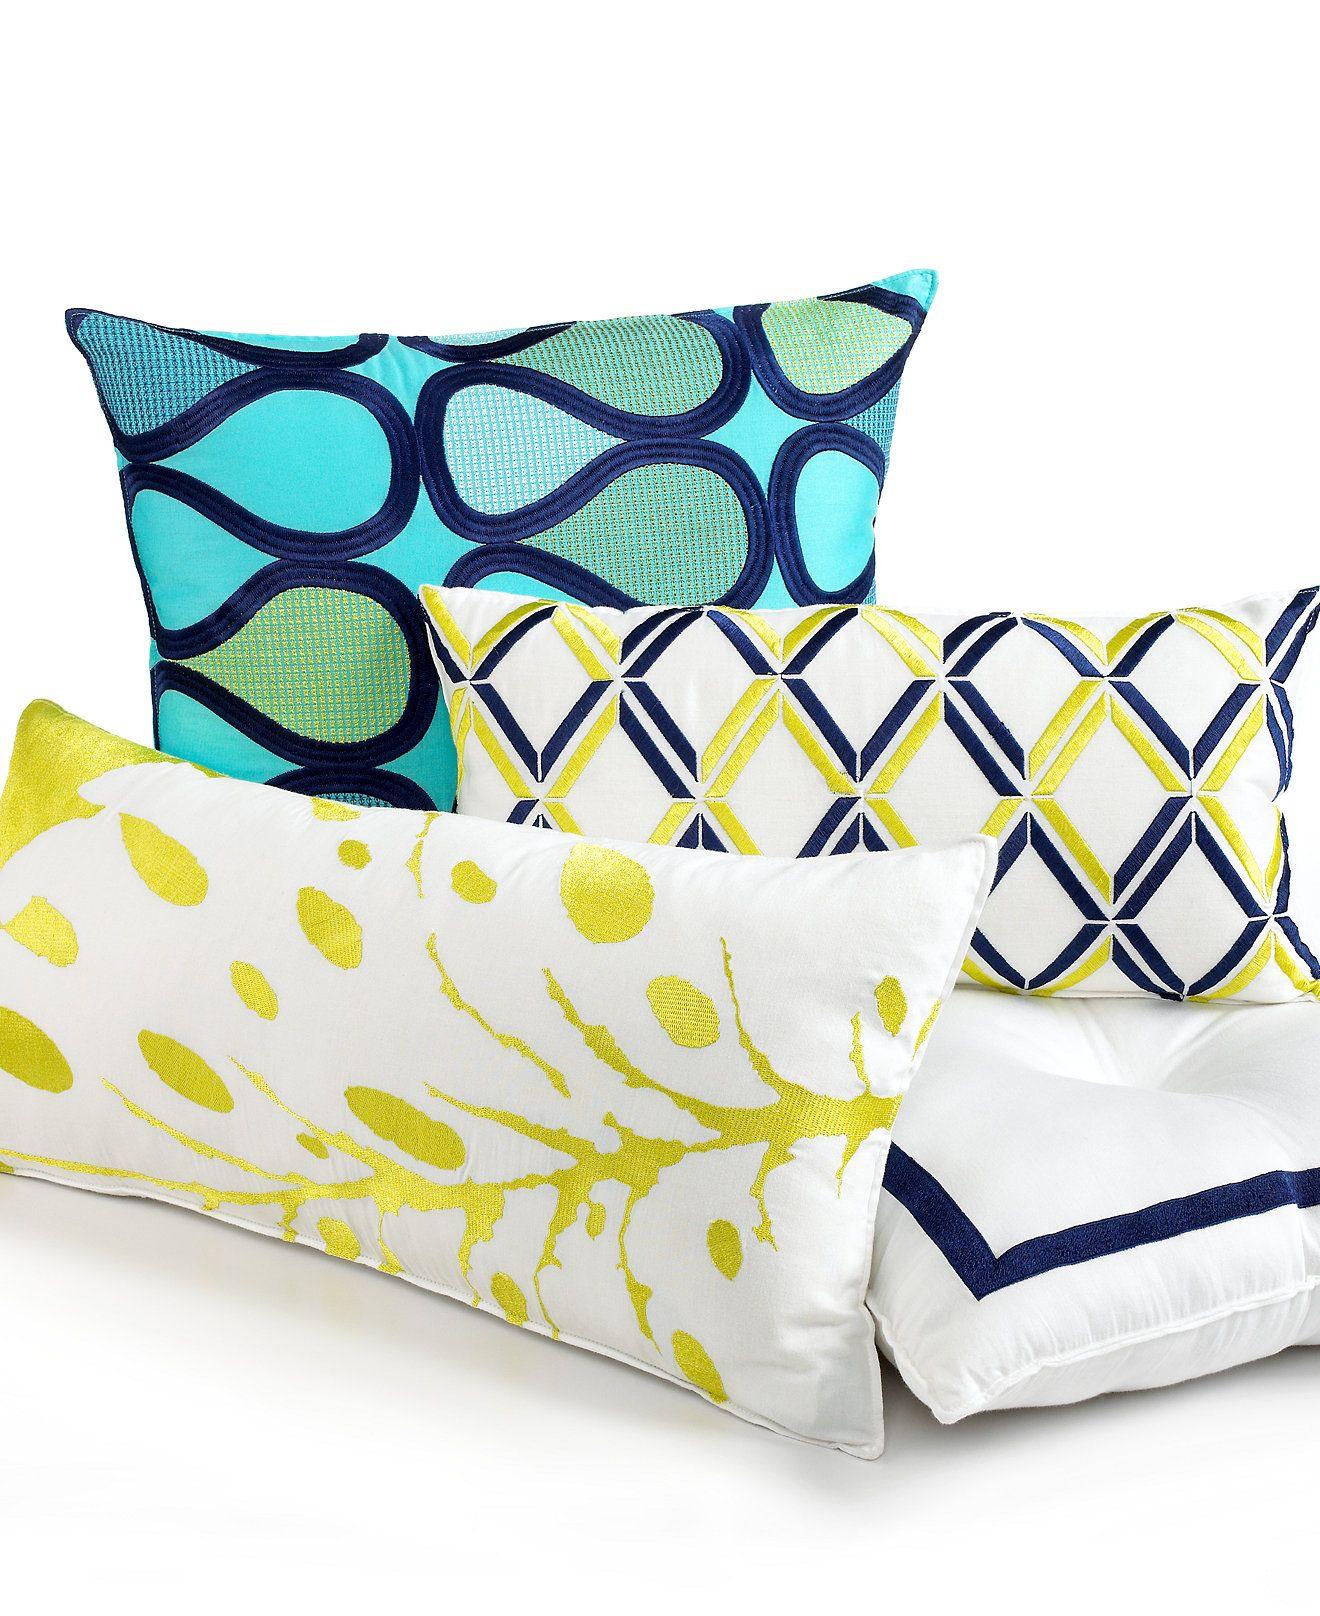 Trina Turk Bedding, Blue Peacock Decorative Pillows - Decorative ...